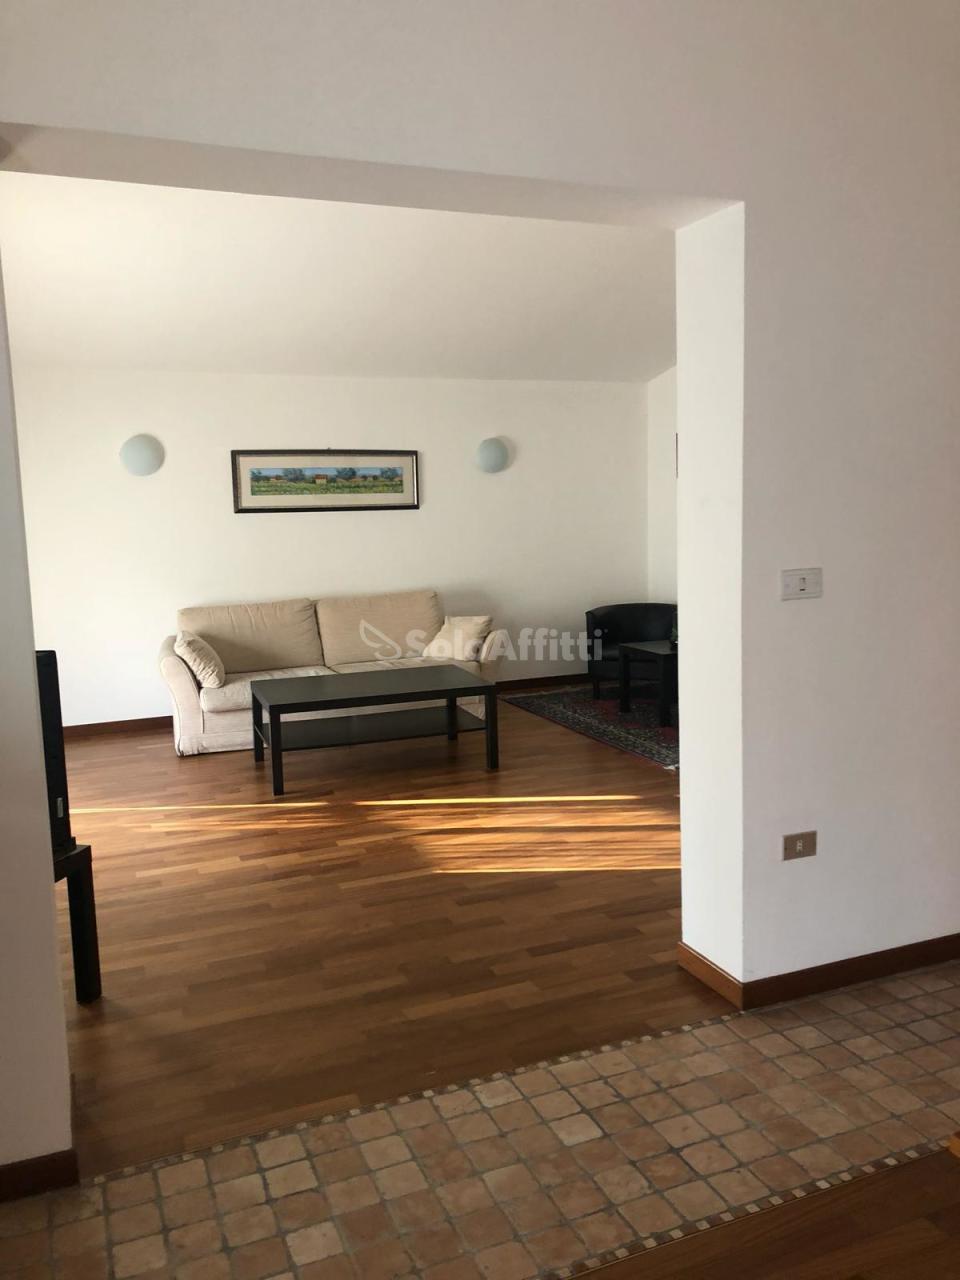 Appartamento - Quadrilocale a Via Nicola Fabrizi, Pescara